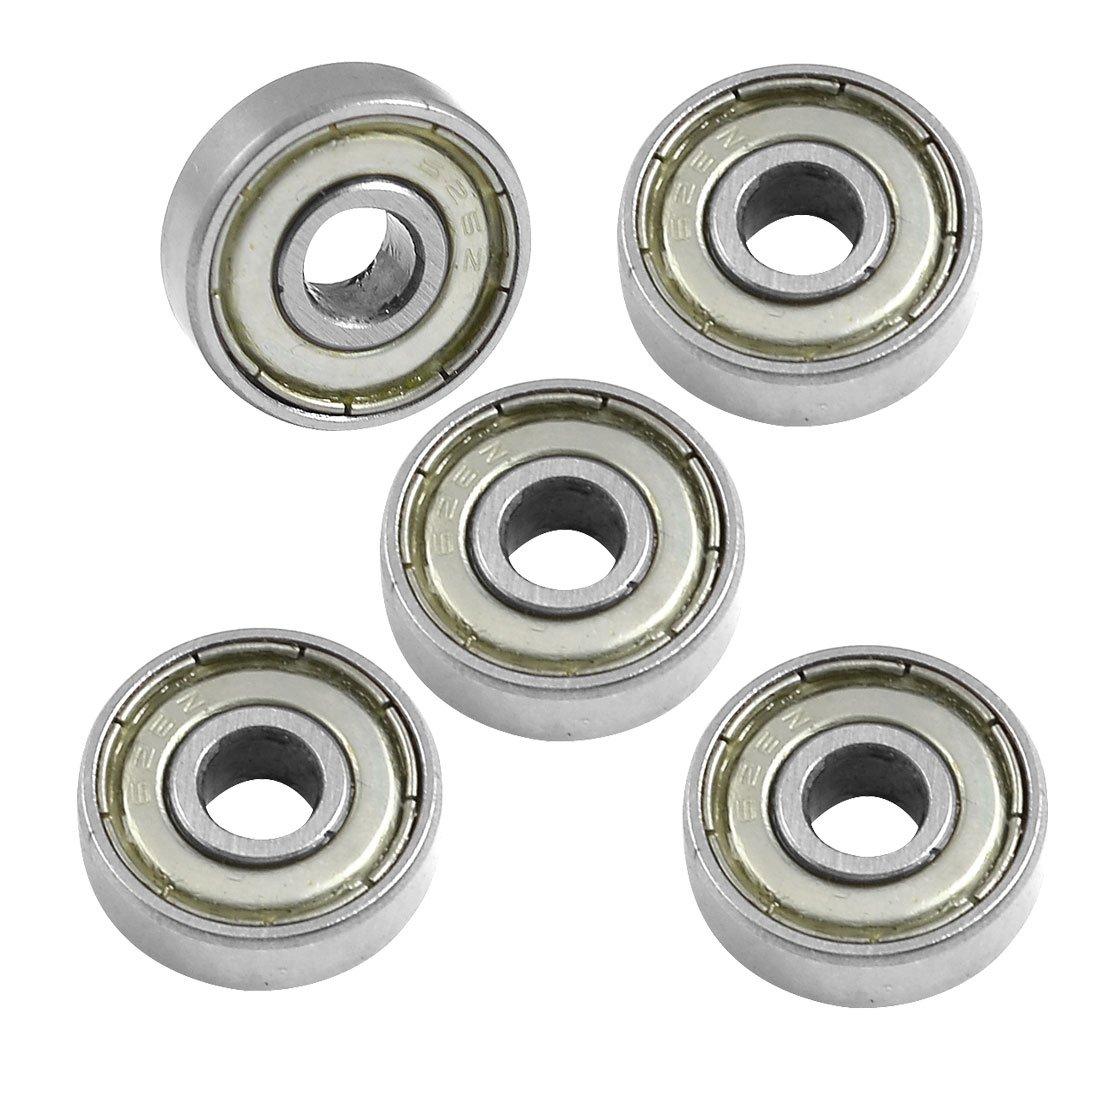 цена на THGS 626Z 6mm x 19mm x 6mm Shielded Radial Miniature Deep Groove Ball Bearing 5 pcs